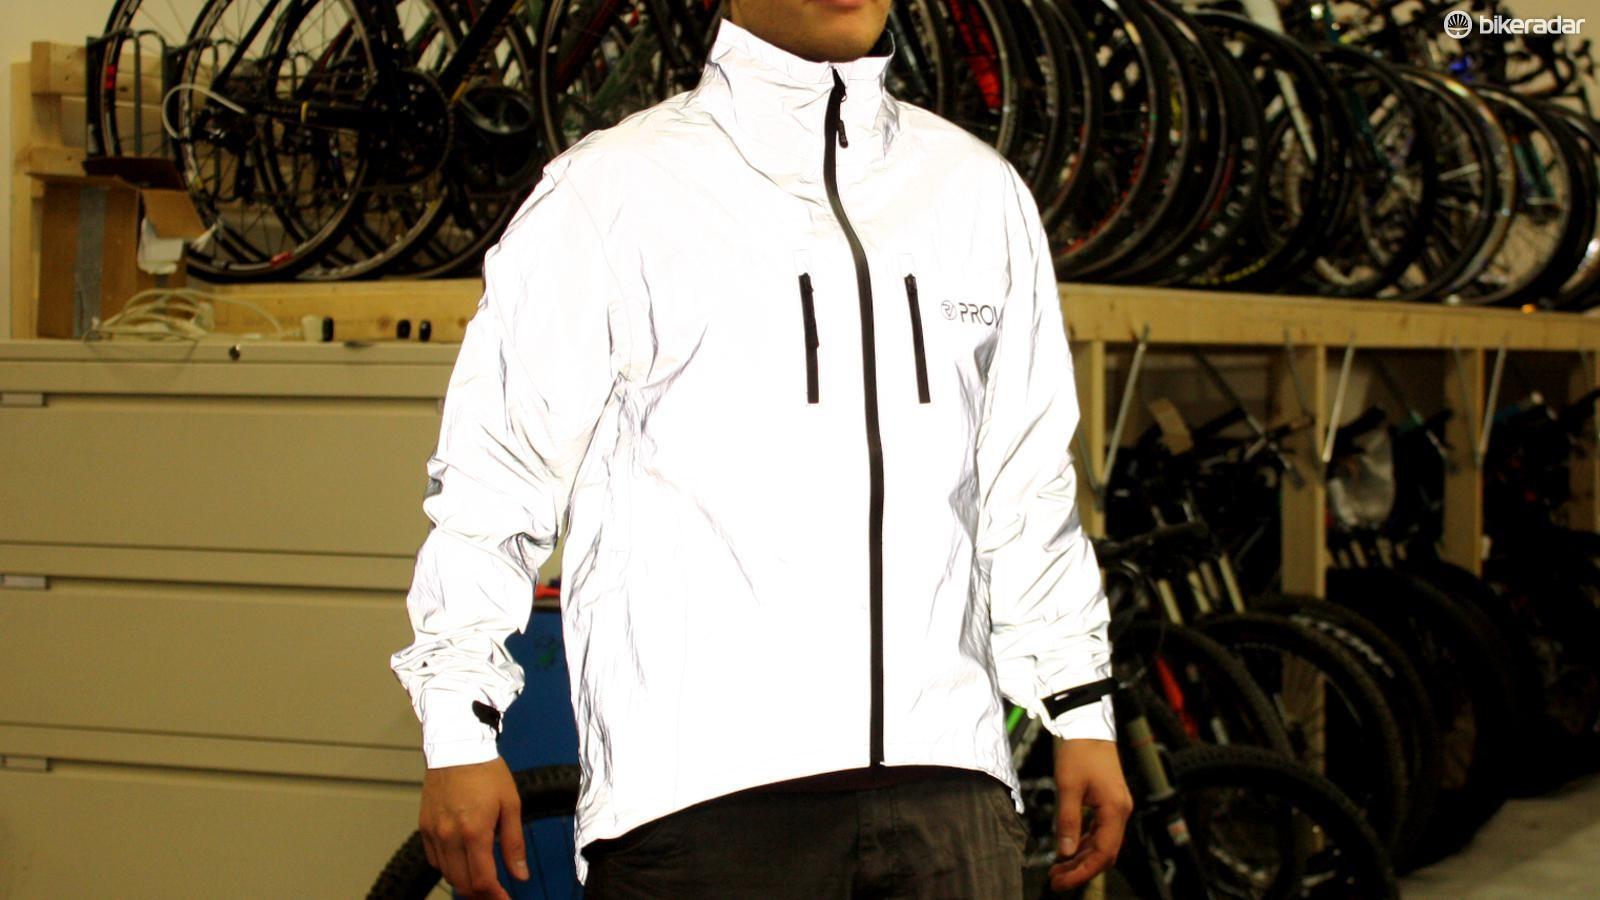 ProViz clothing is eye-poppingly reflective